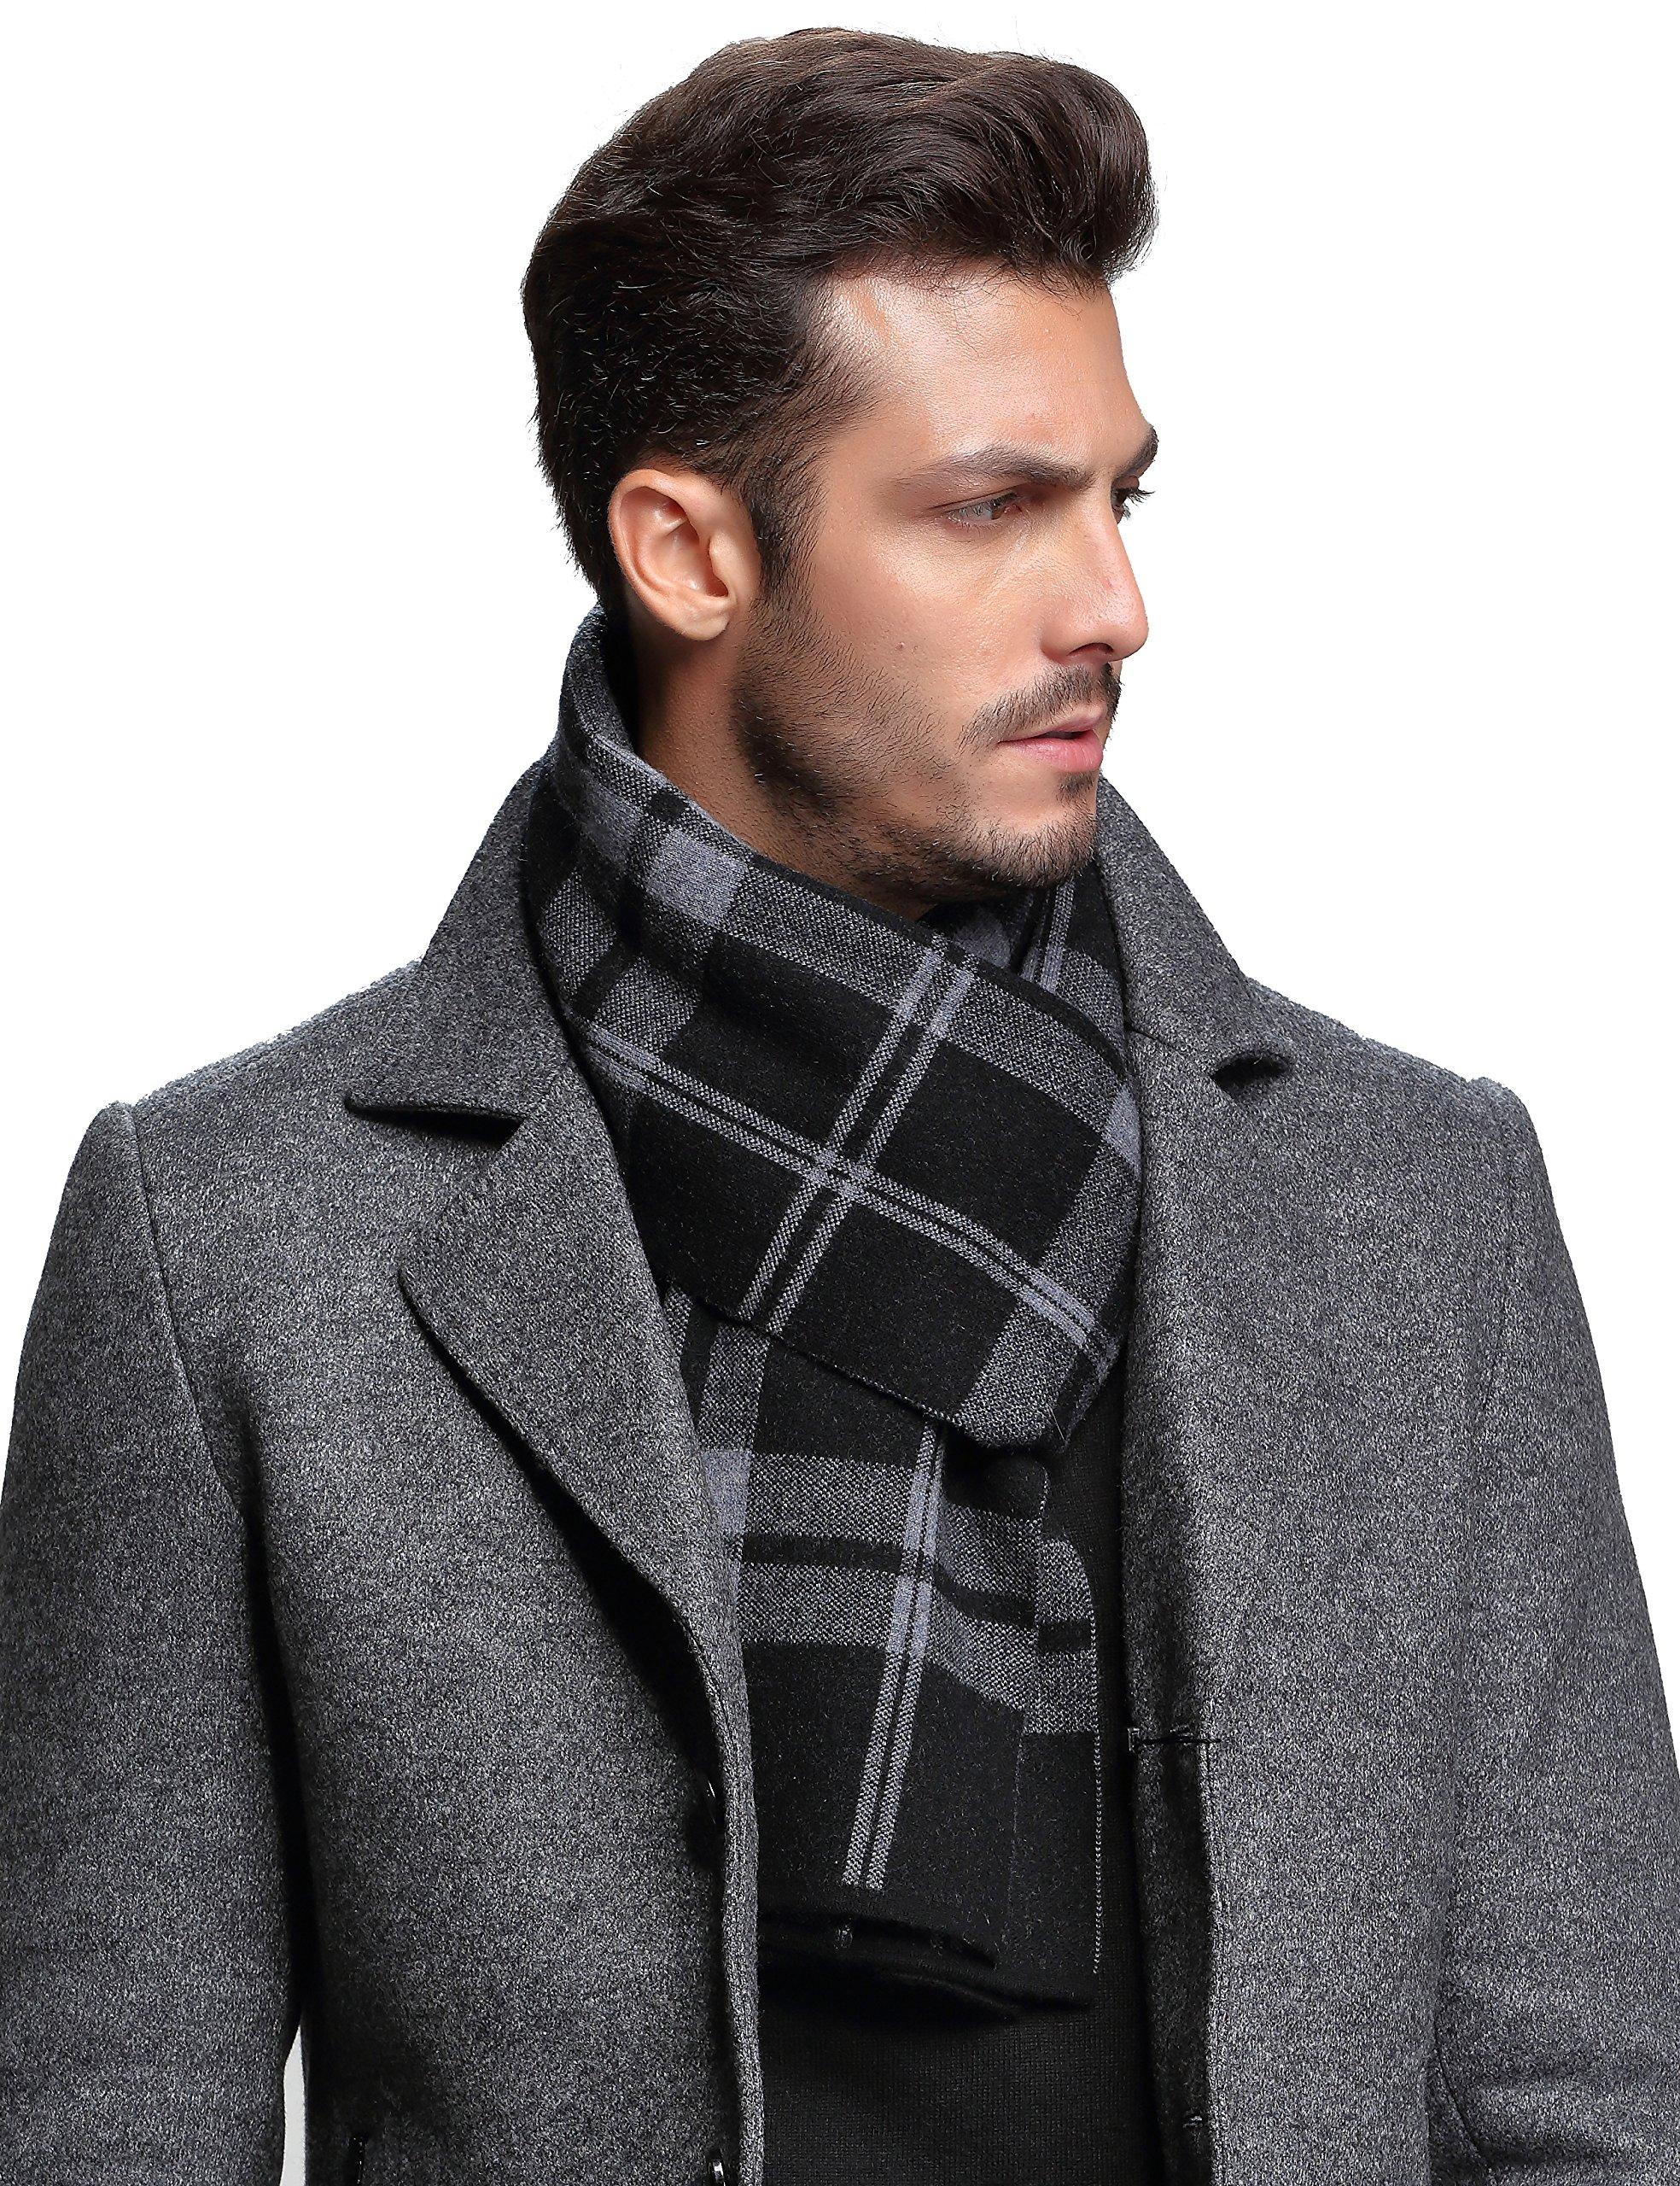 Ellettee, 100% Australian Wool Men Scarf Classic Knitted Long NeckwearStripe Plaid Scarves (Plaid BlackGrayWhite)